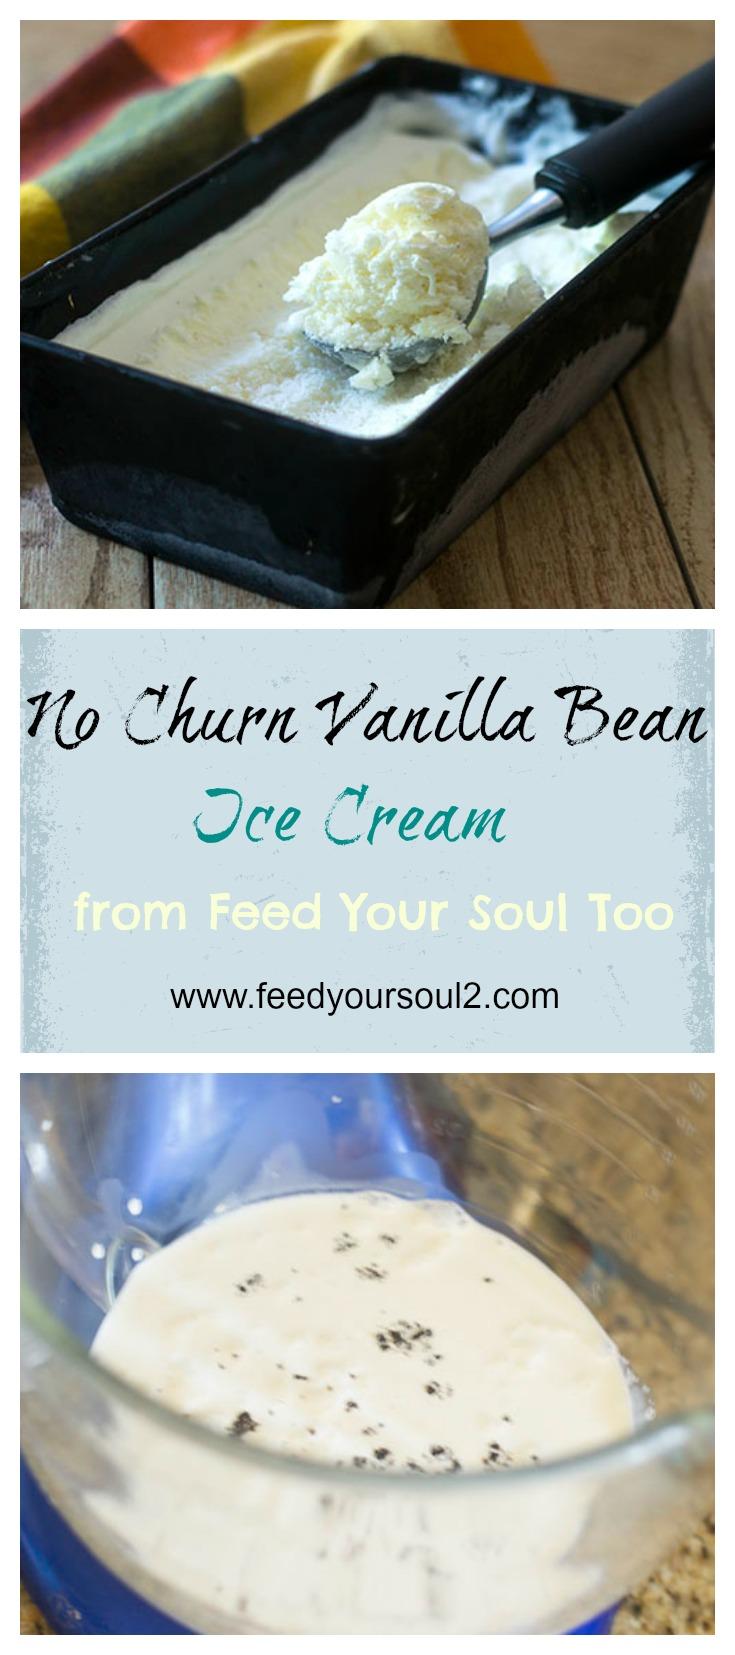 No Churn Vanilla Bean Ice Cream #Dessert #vanilla #icecream | feedyoursoul2.com